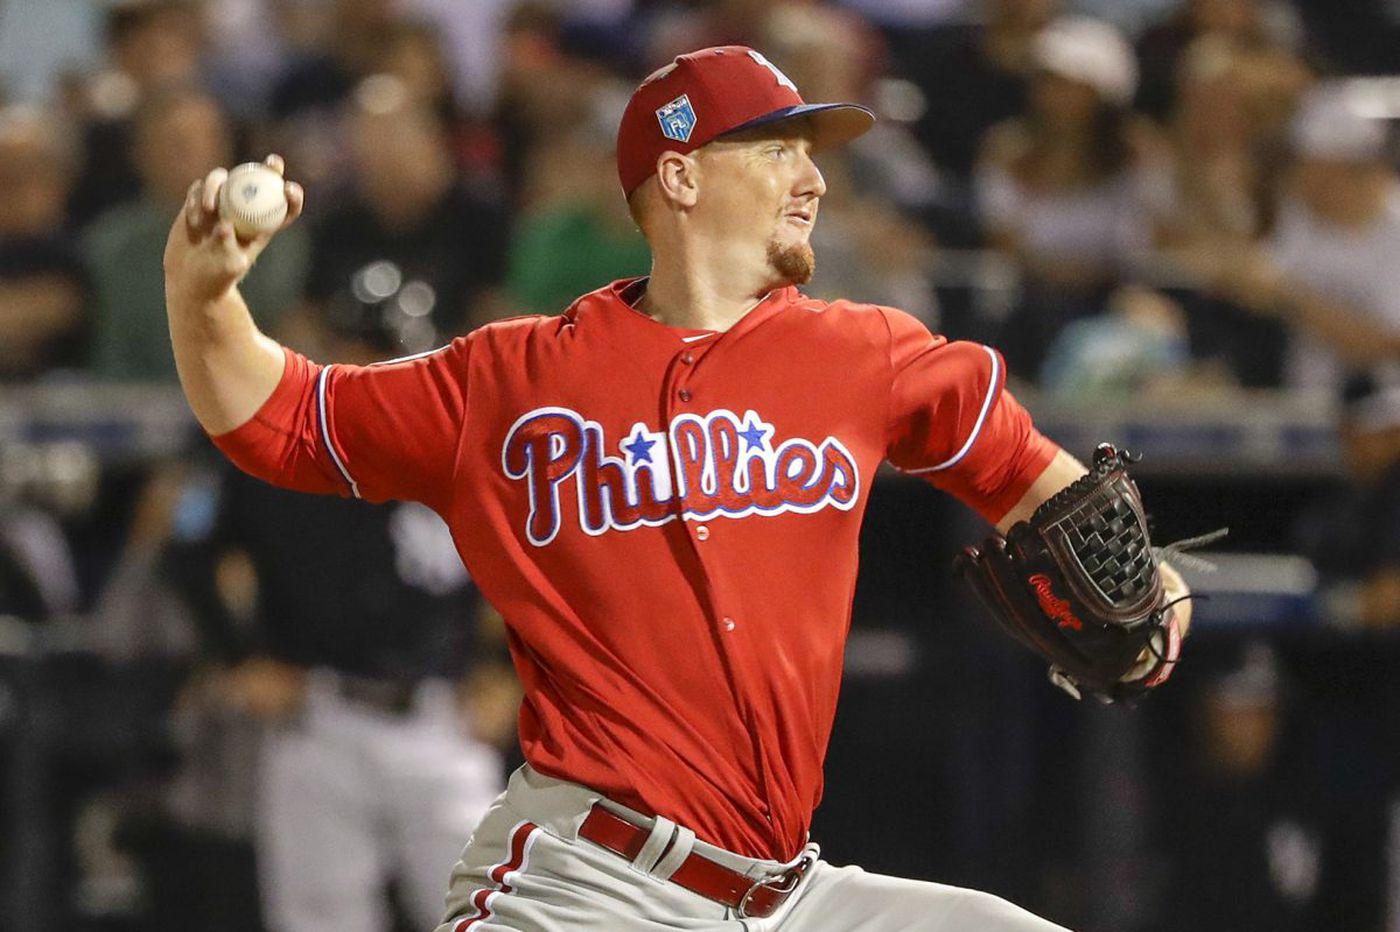 Phillies minor league report: Lehigh Valley stumbles, Jan Hernandez hits grand slam for Reading